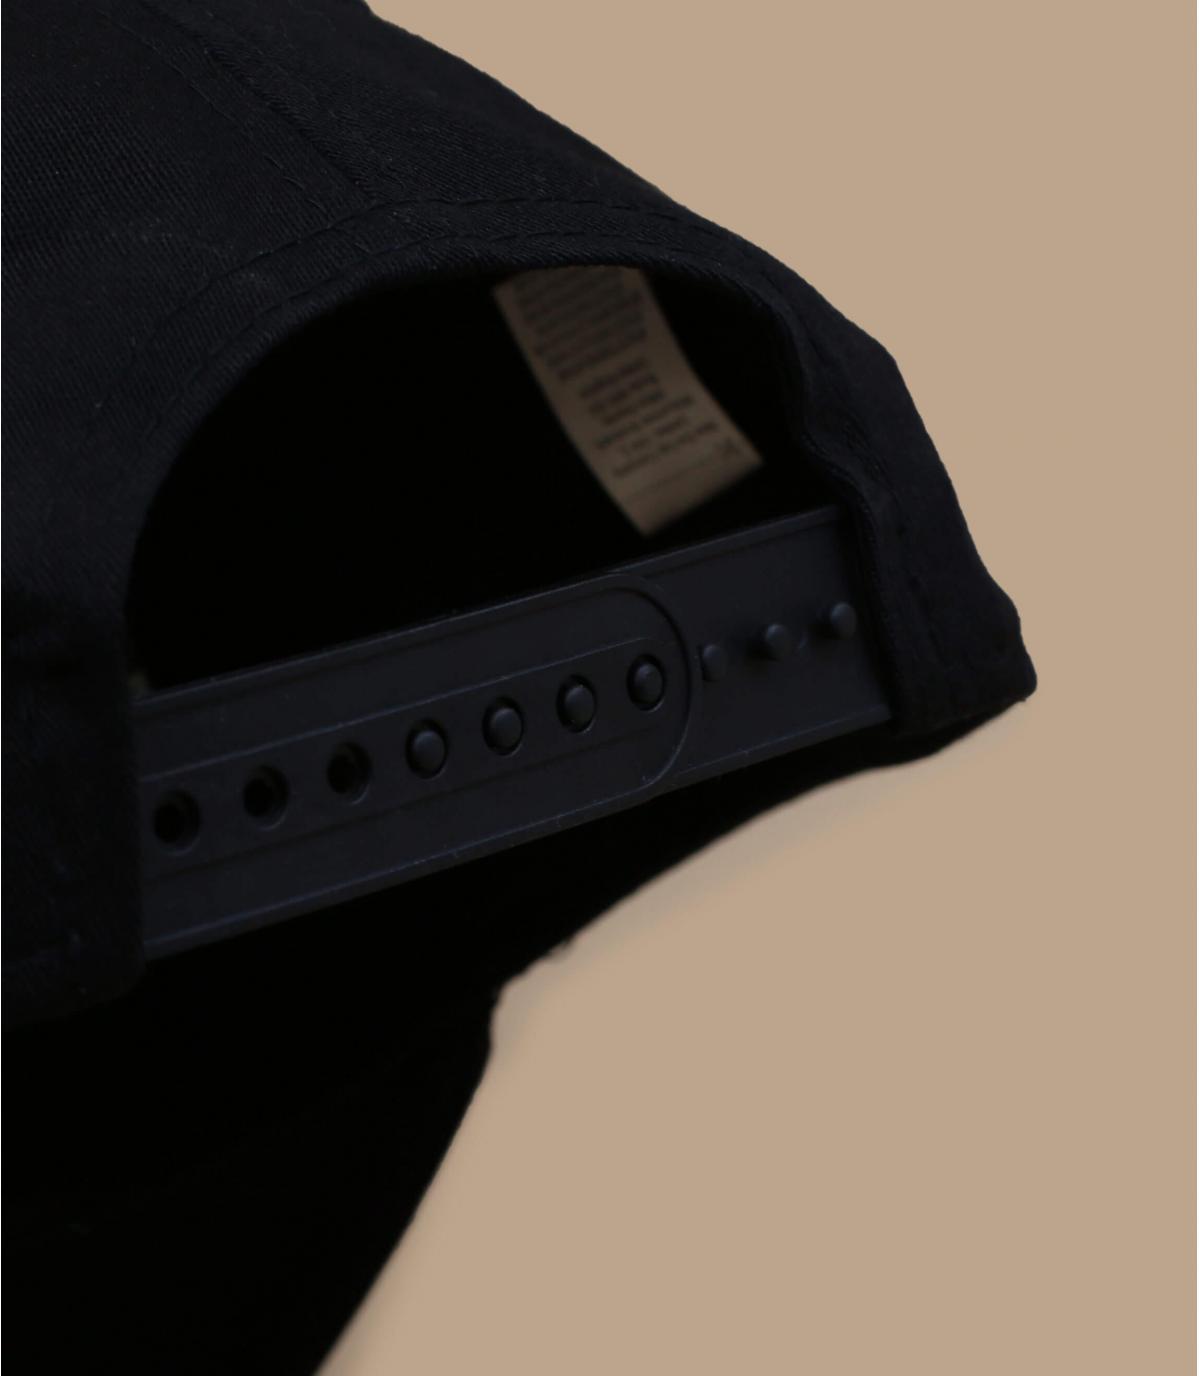 Dettagli Outdoors 950 Stretch black - image 3